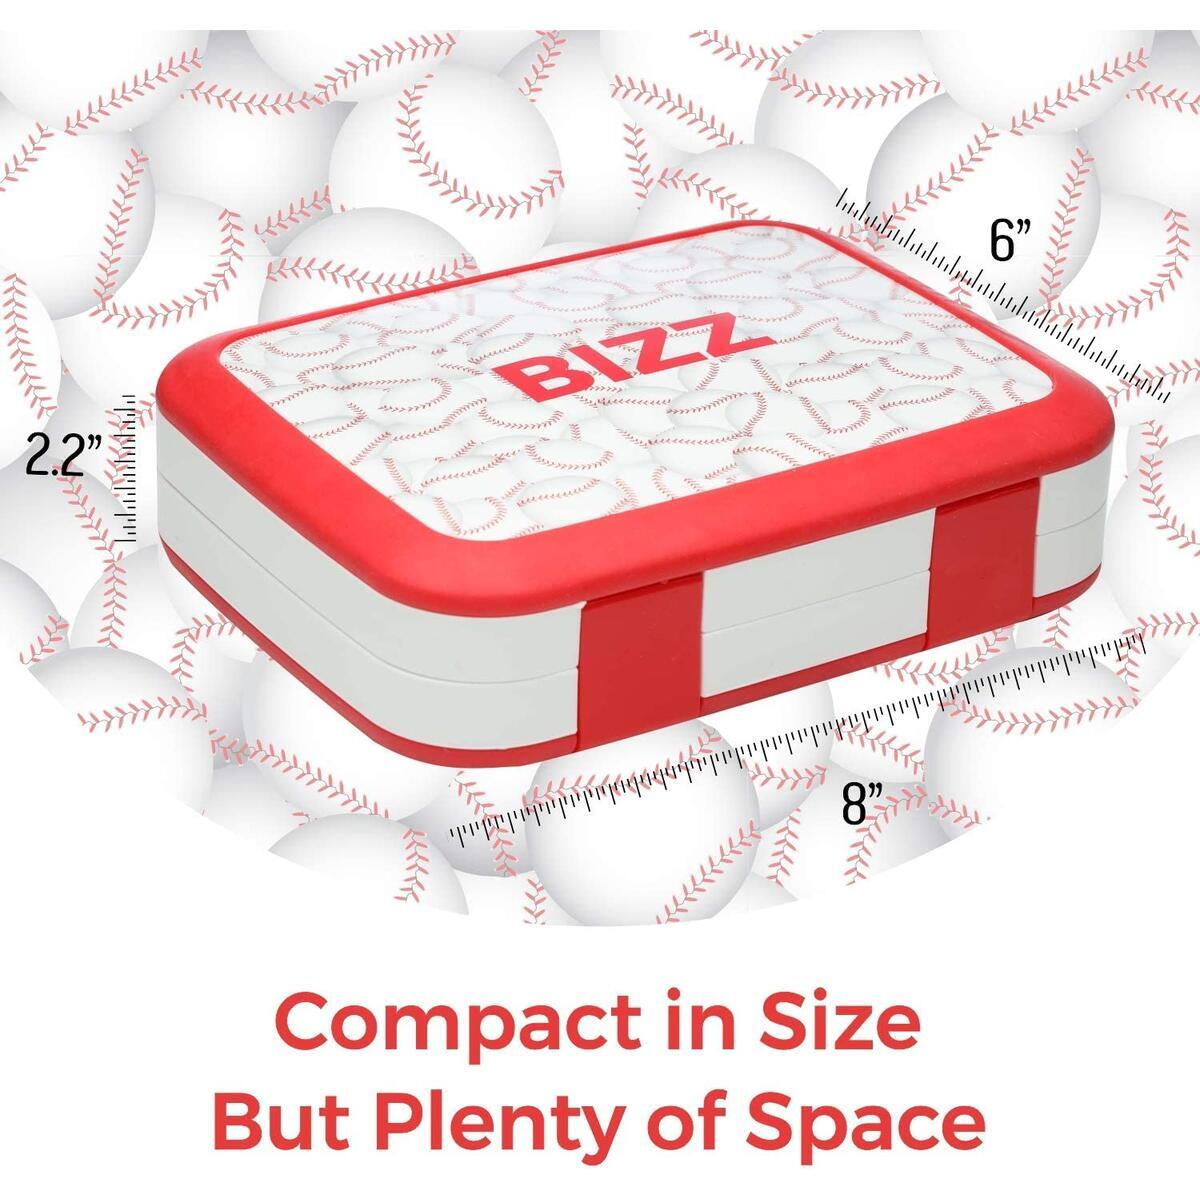 Bento Boxes - Baseball Basketball - Spoons Forks Included - 2pk